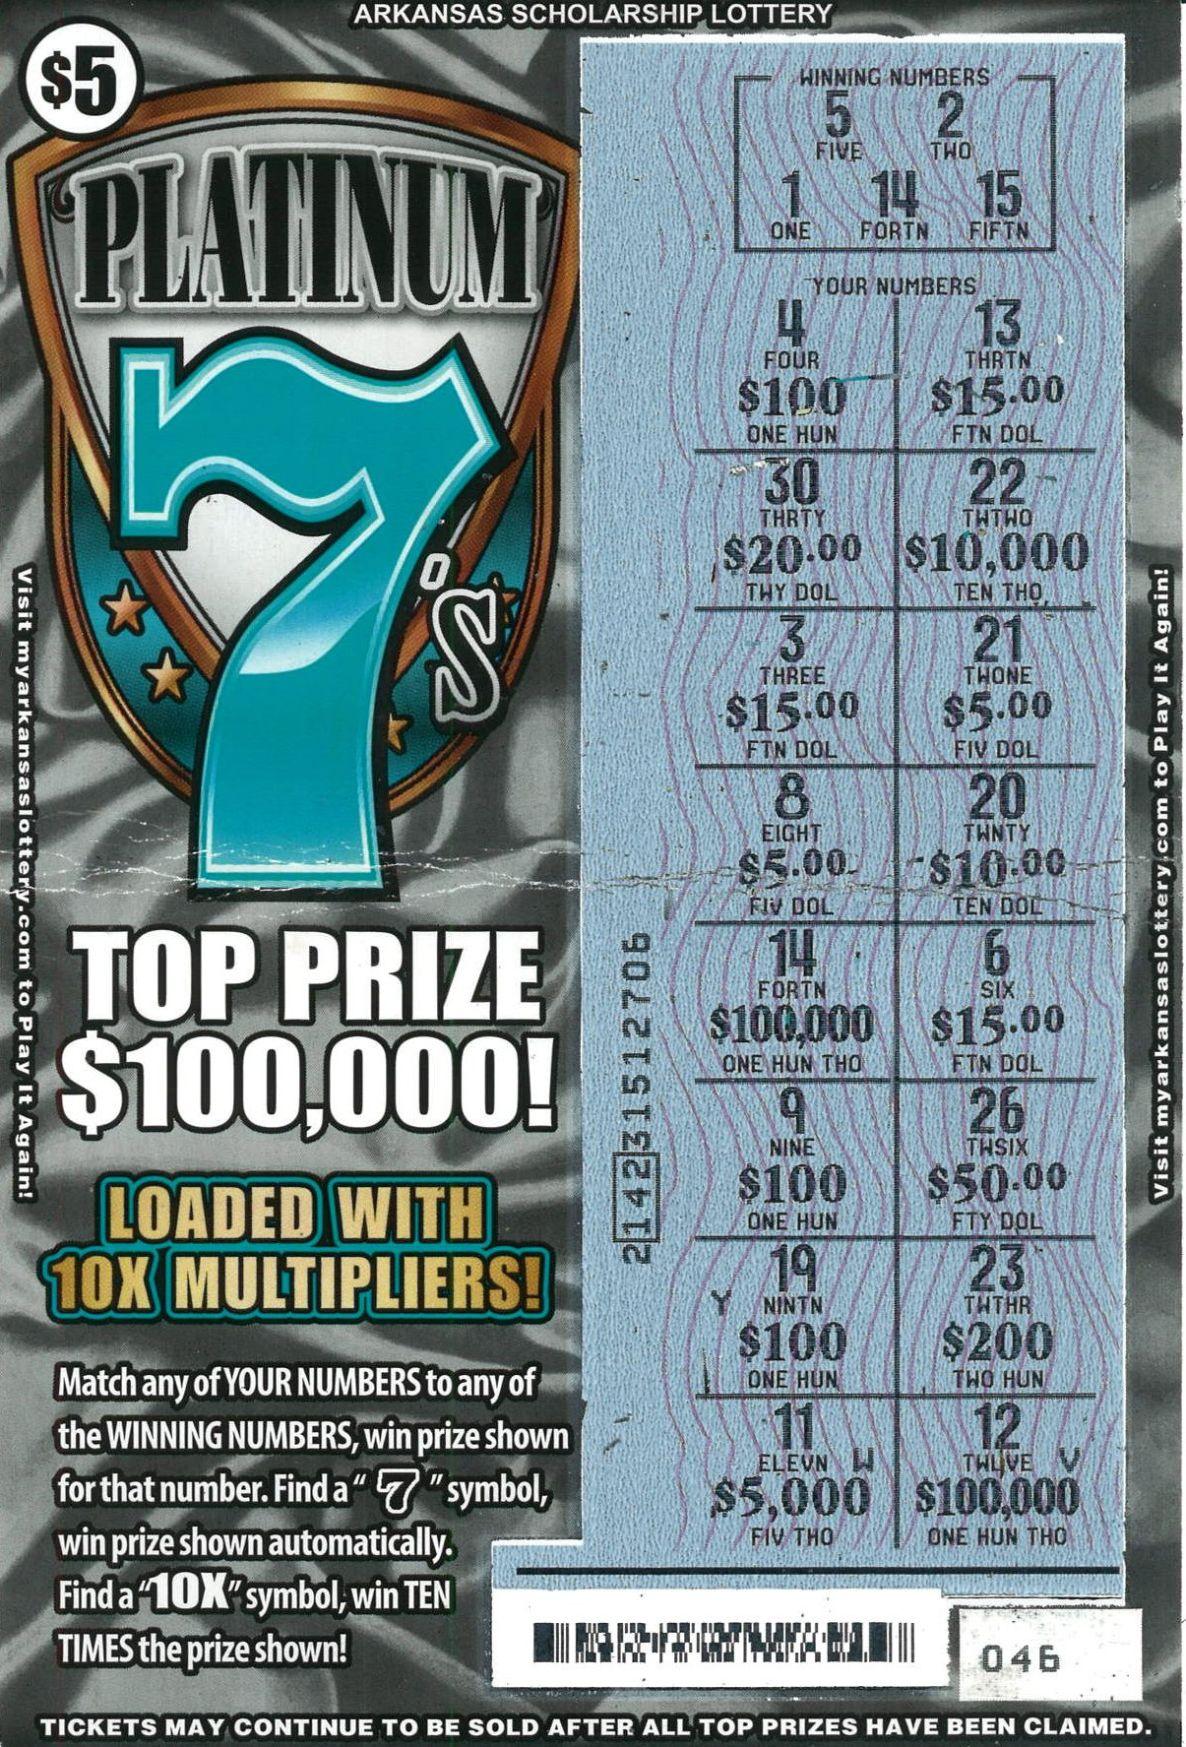 Arkansas lottery drawing tonight